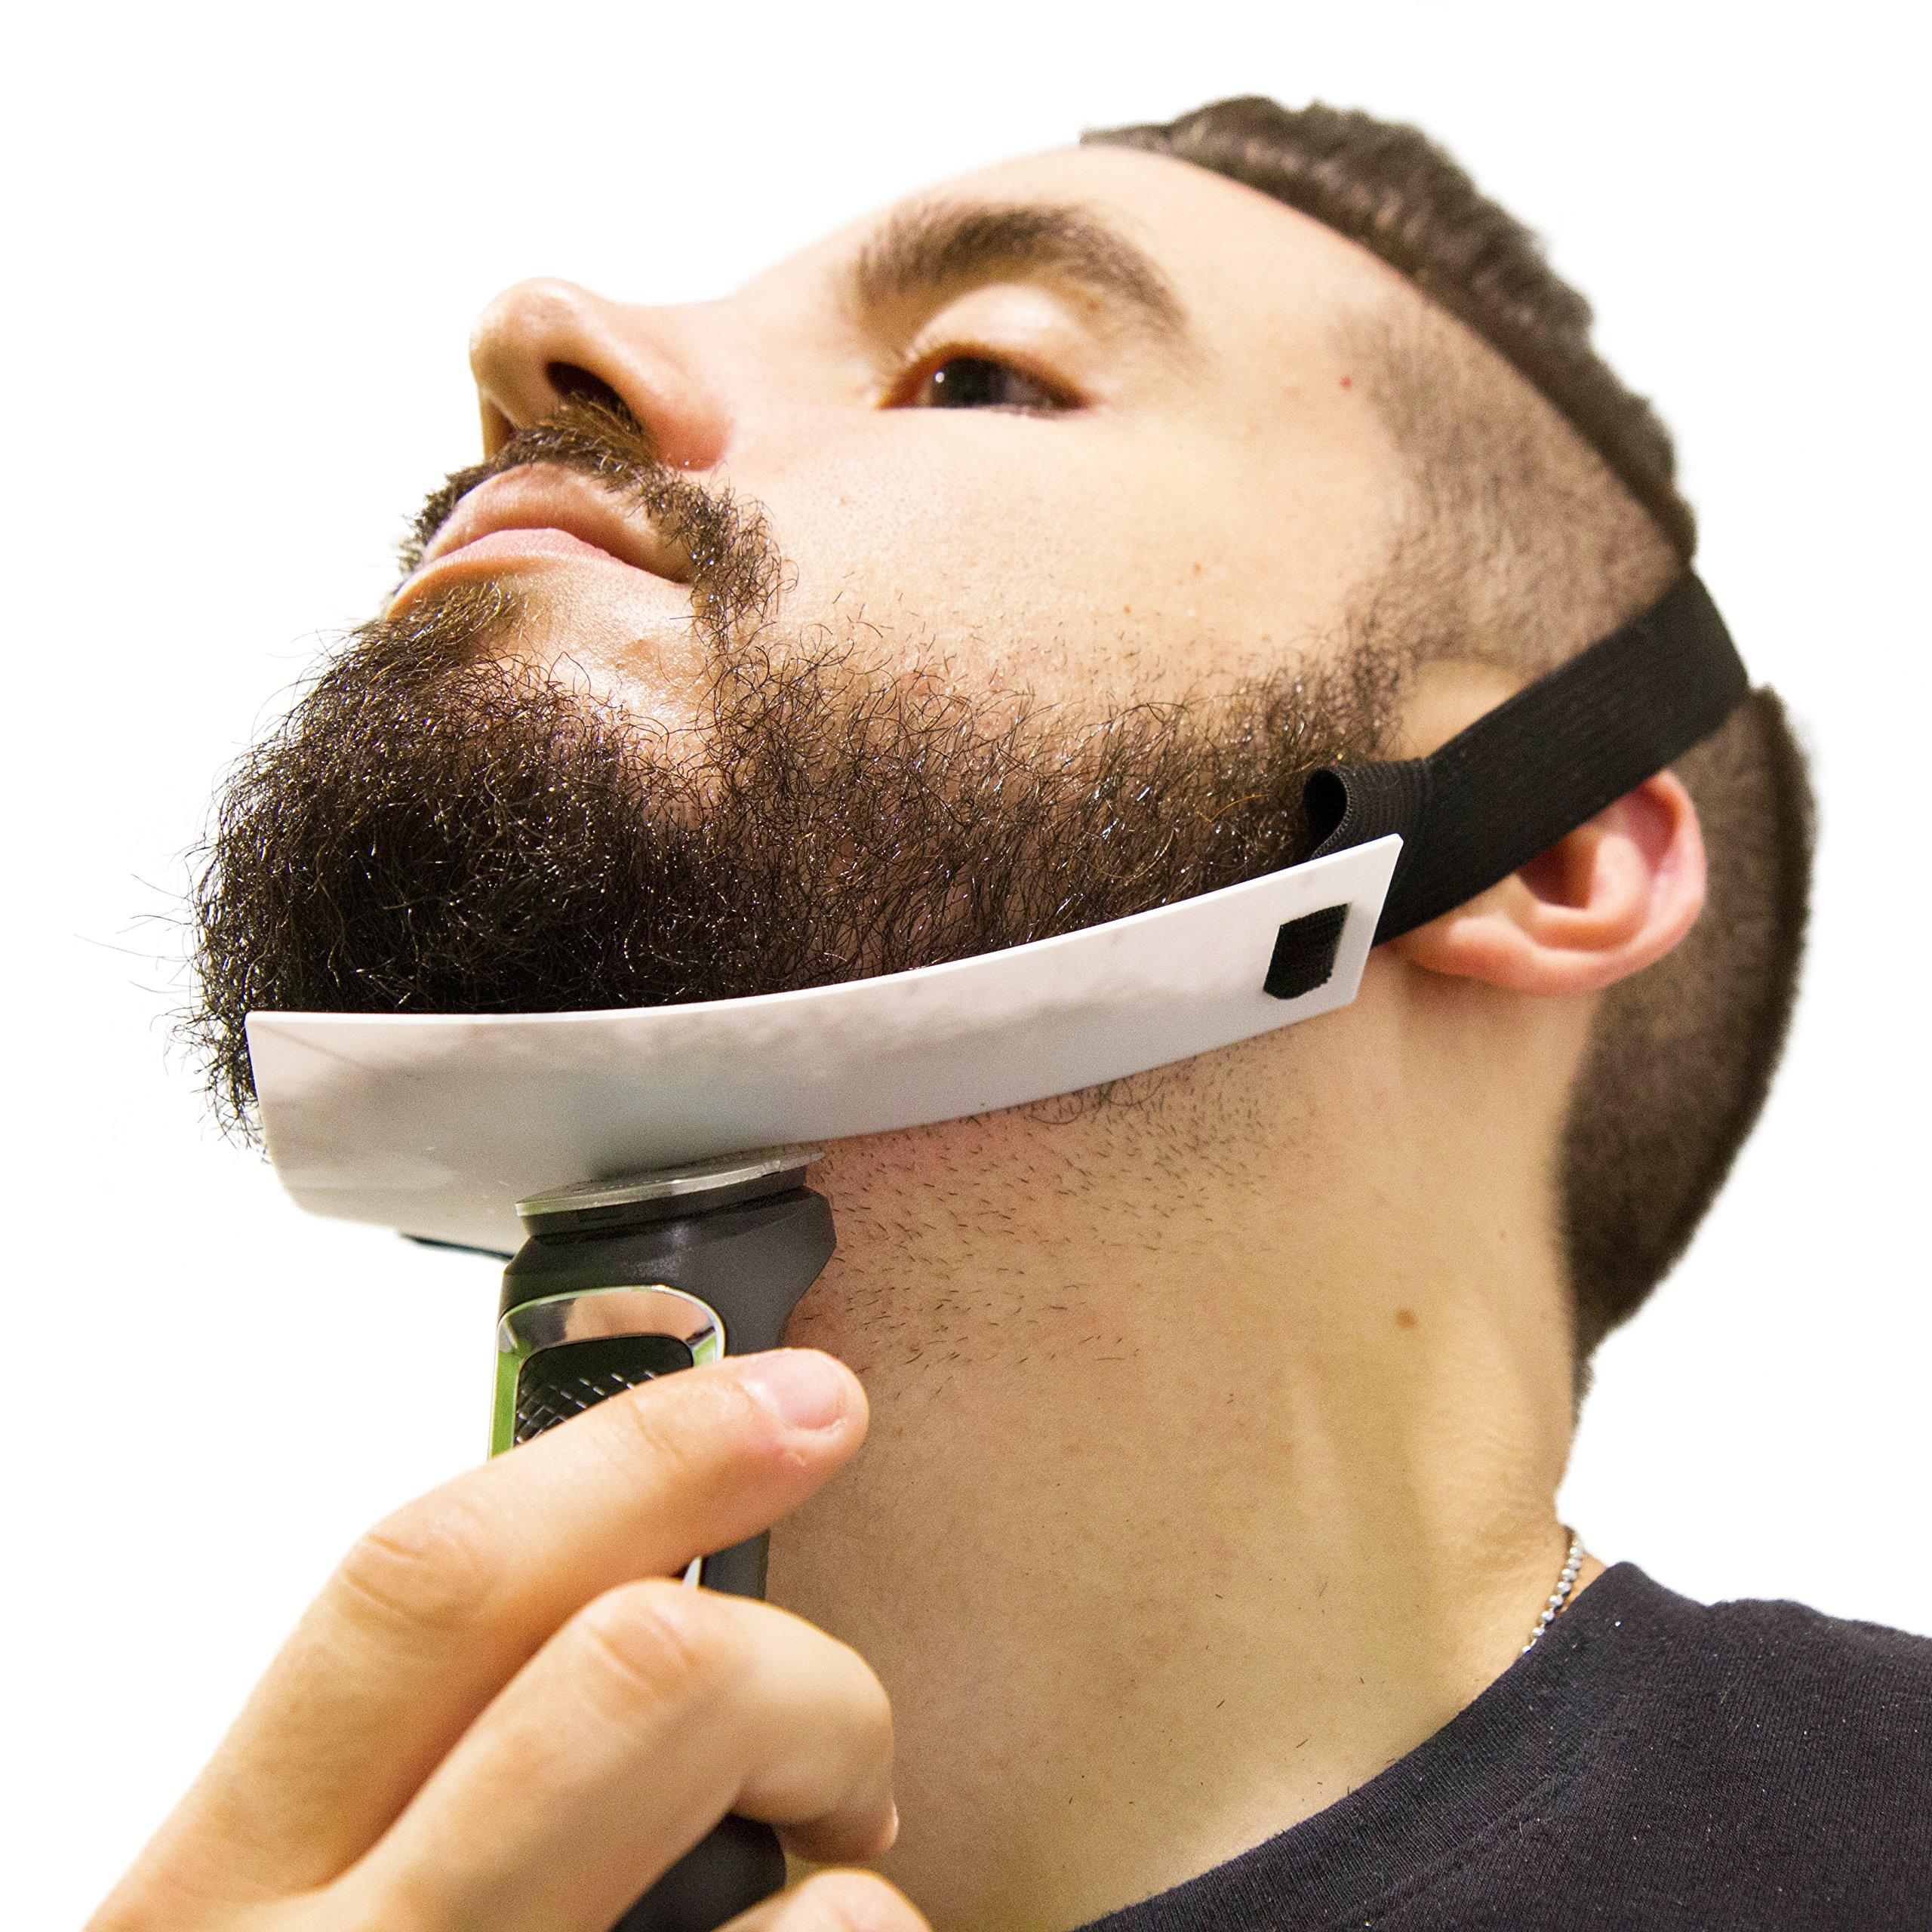 Aberlite Beard Shaper - FlexShaper Neckline Guide - Hands-Free & Flexible - The Ultimate Neckline Beard Shaping Template (Patent Pending)(White)- Beard Trimmer Guide - Lineup Stencil Kit